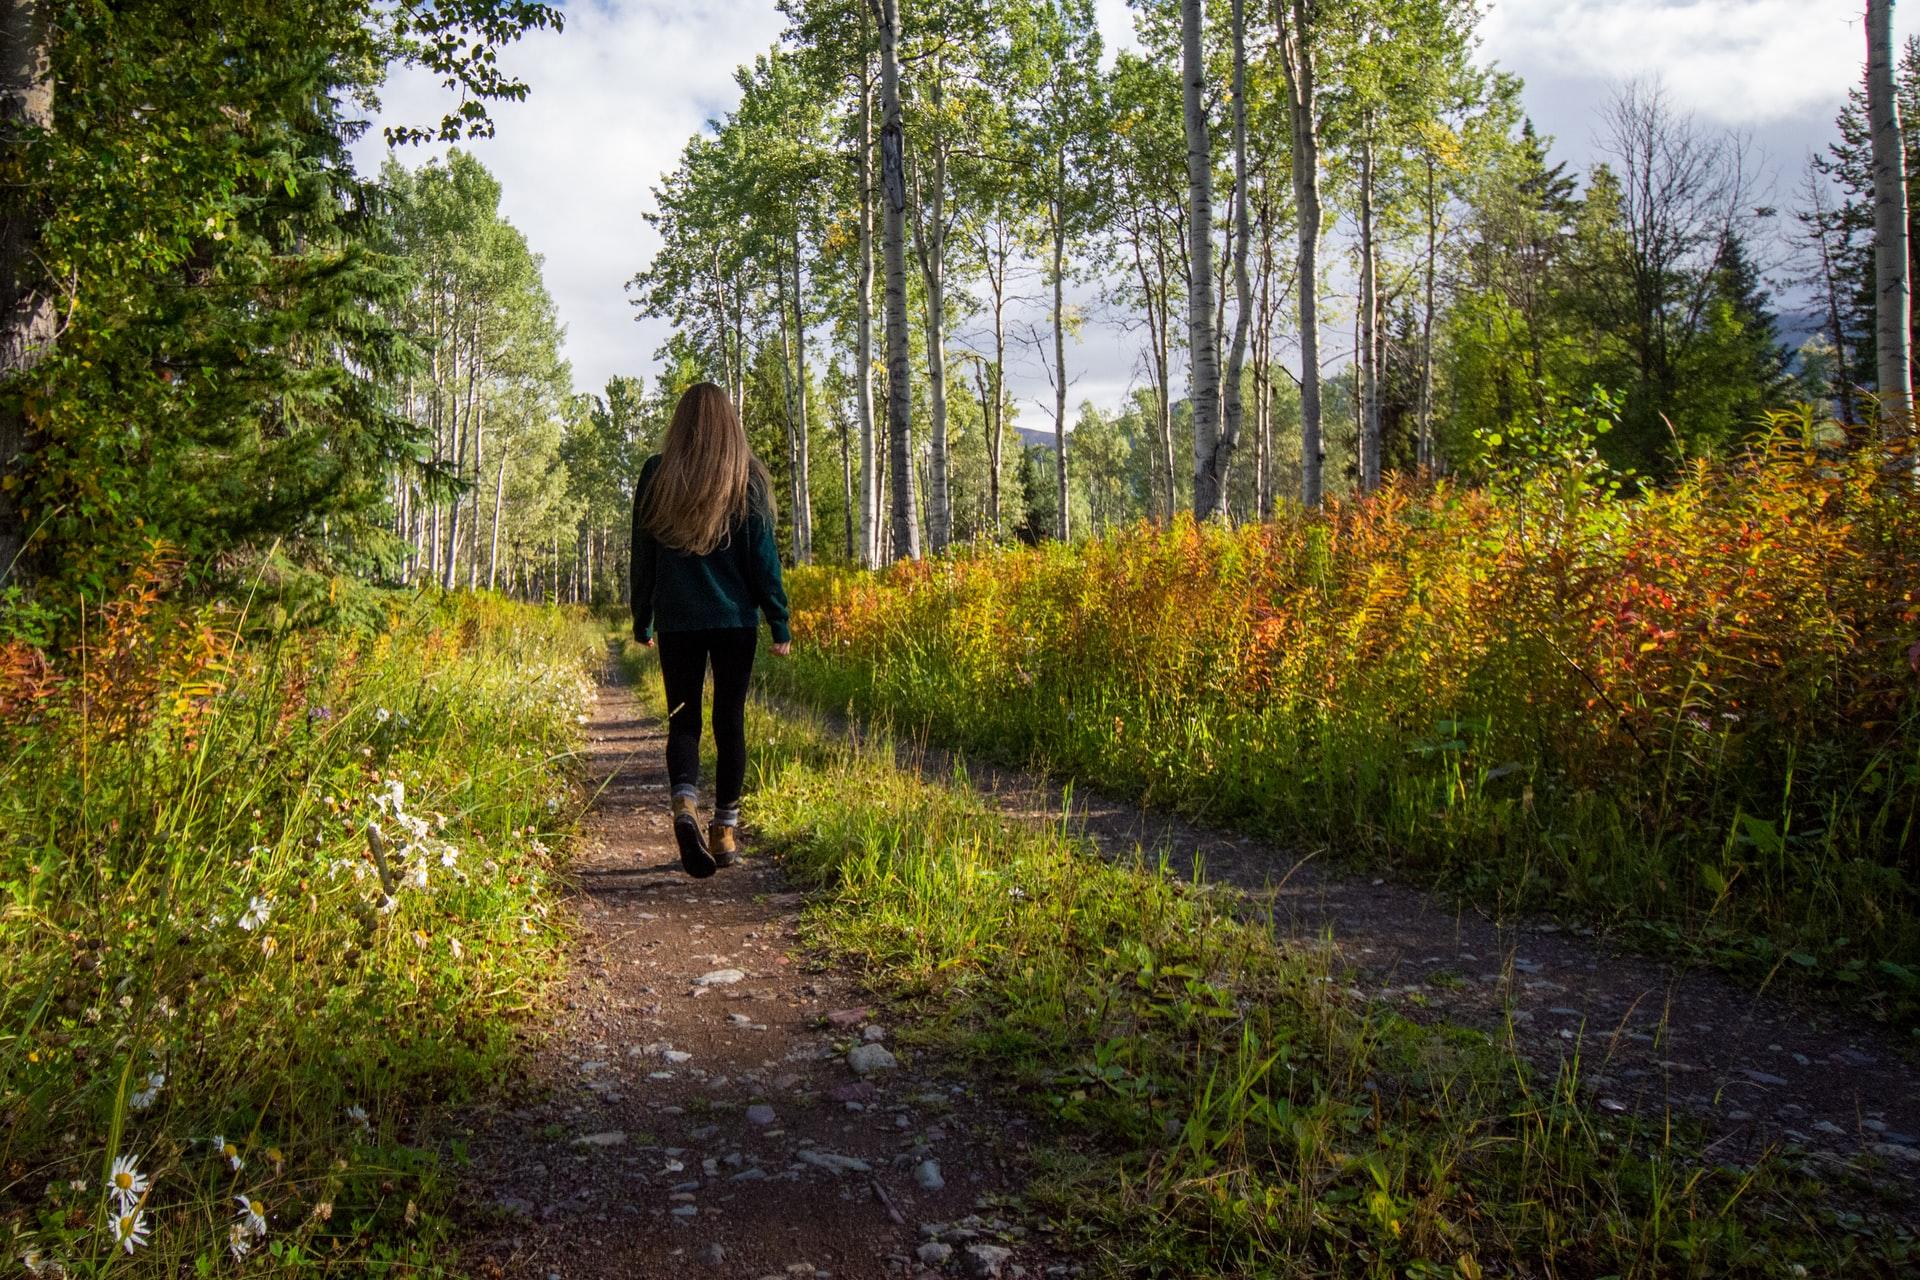 Girl walking through vibrant nature path